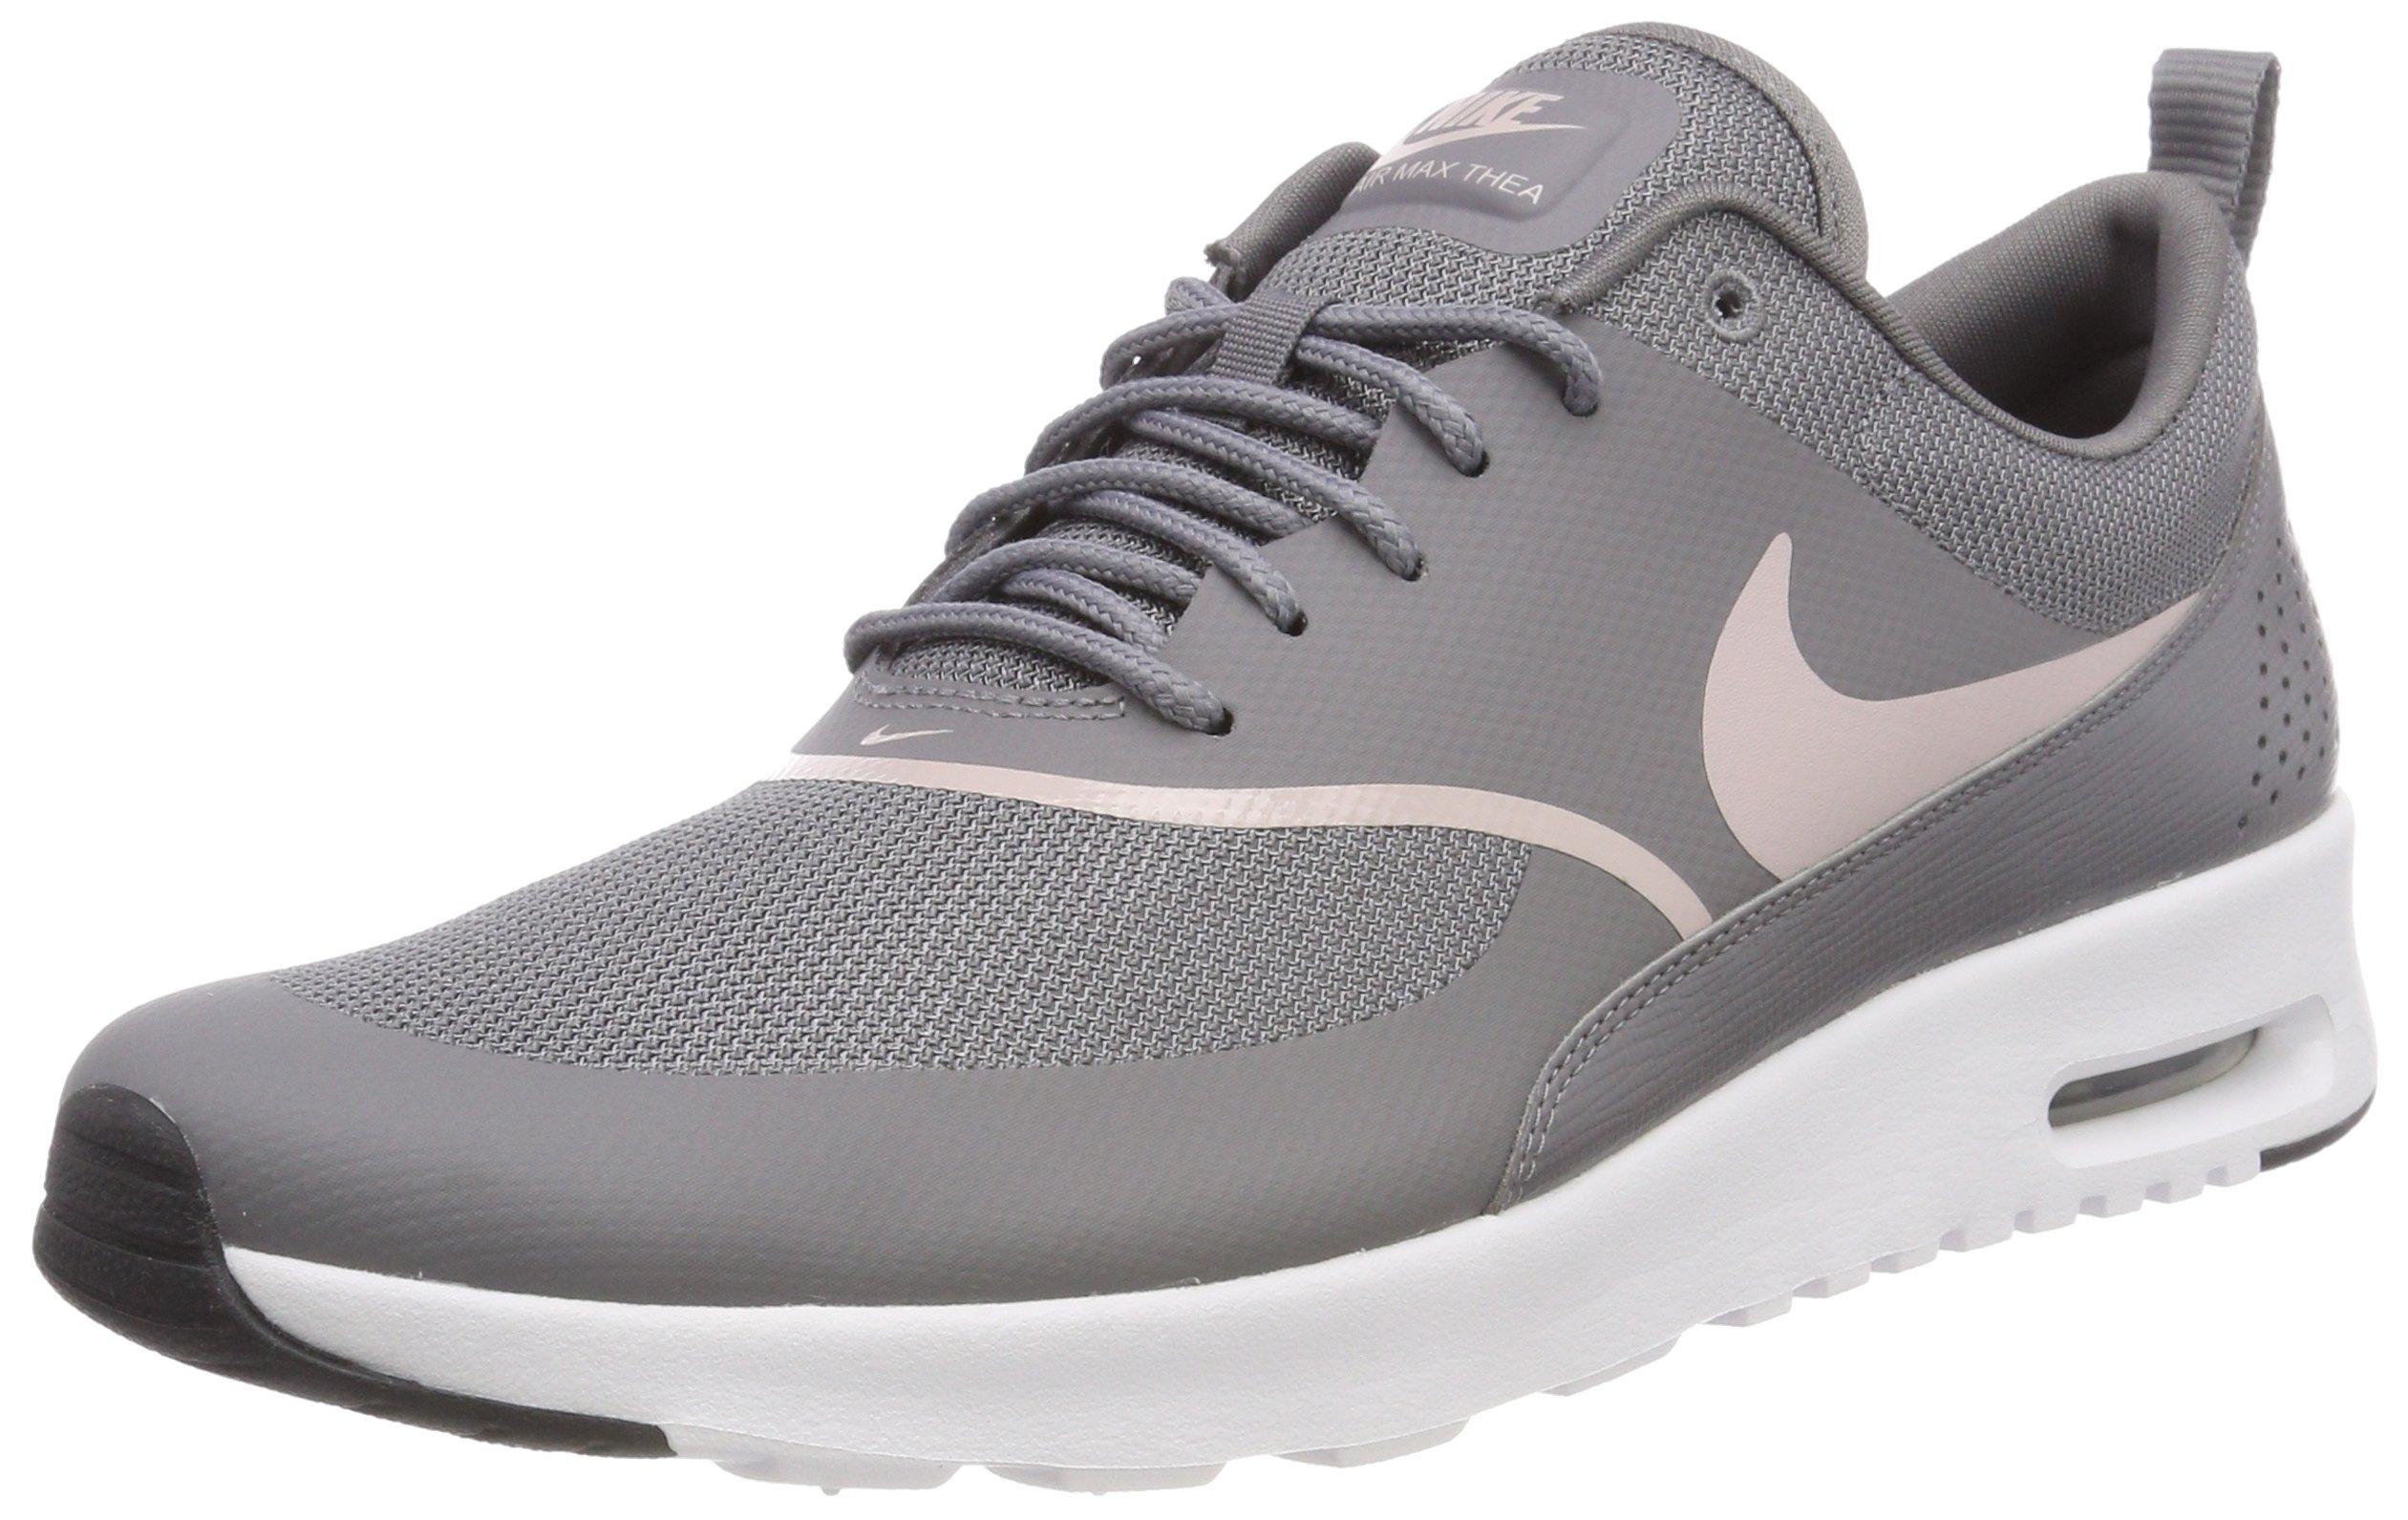 Nike Women's Air Max Thea Low Top Sneakers Buy Online in